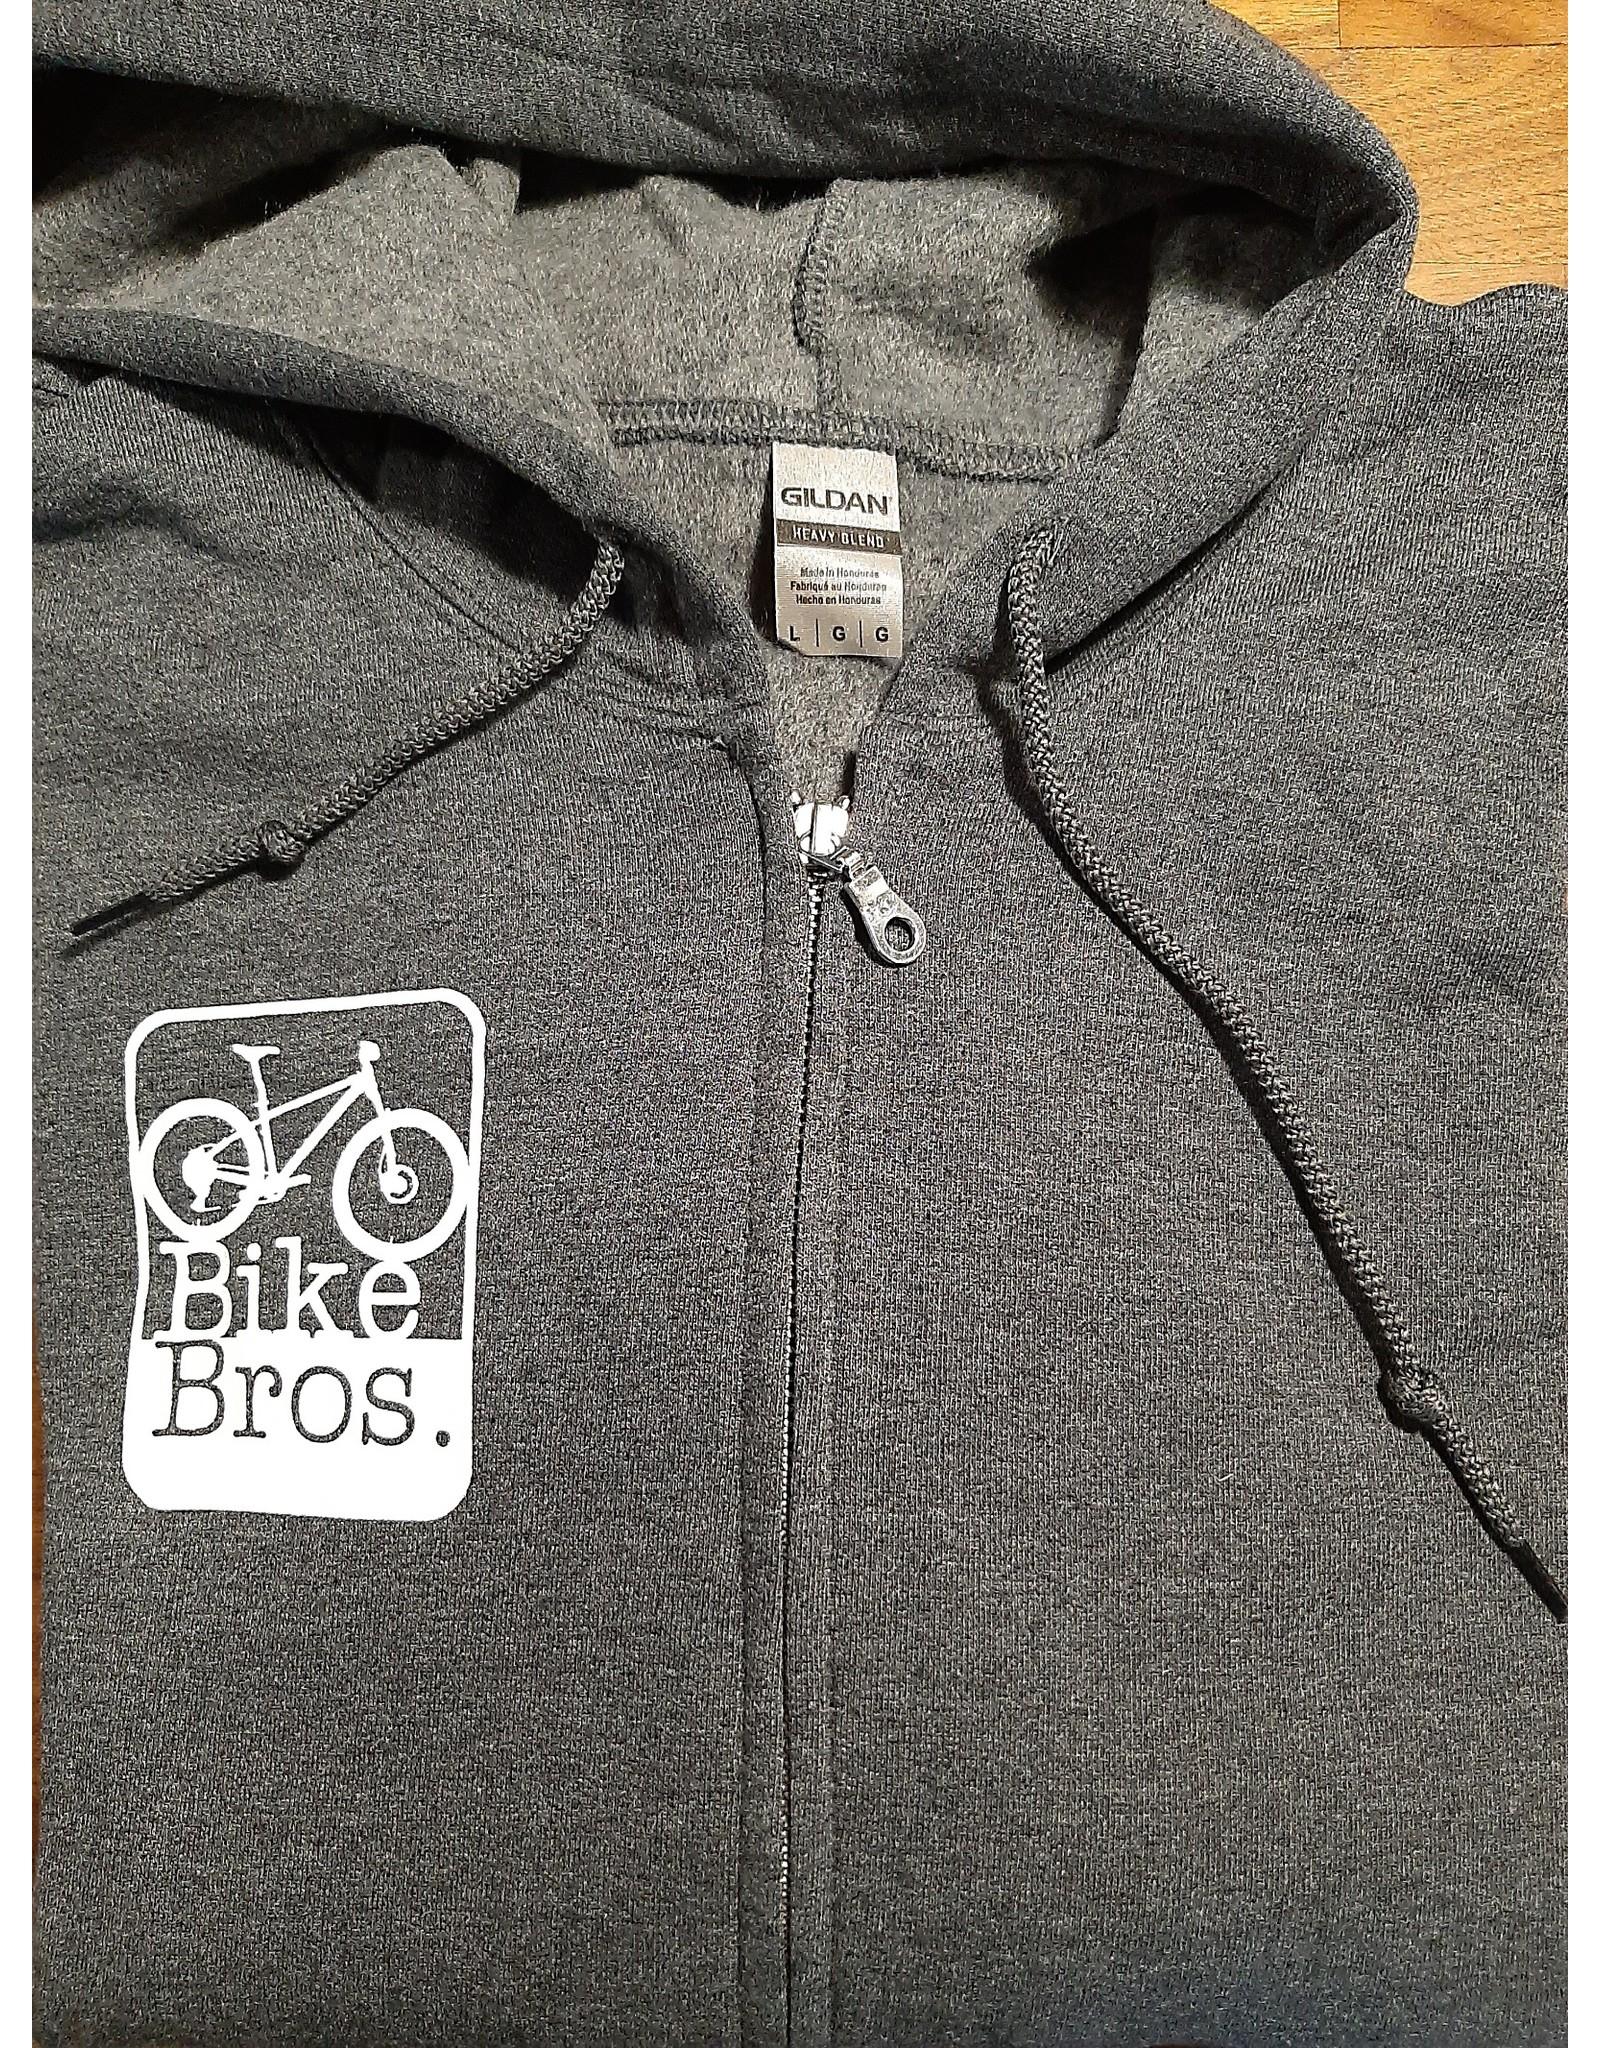 Bike Bros. Rectangle Logo - Bike Bros. Shirt Hoody Zip